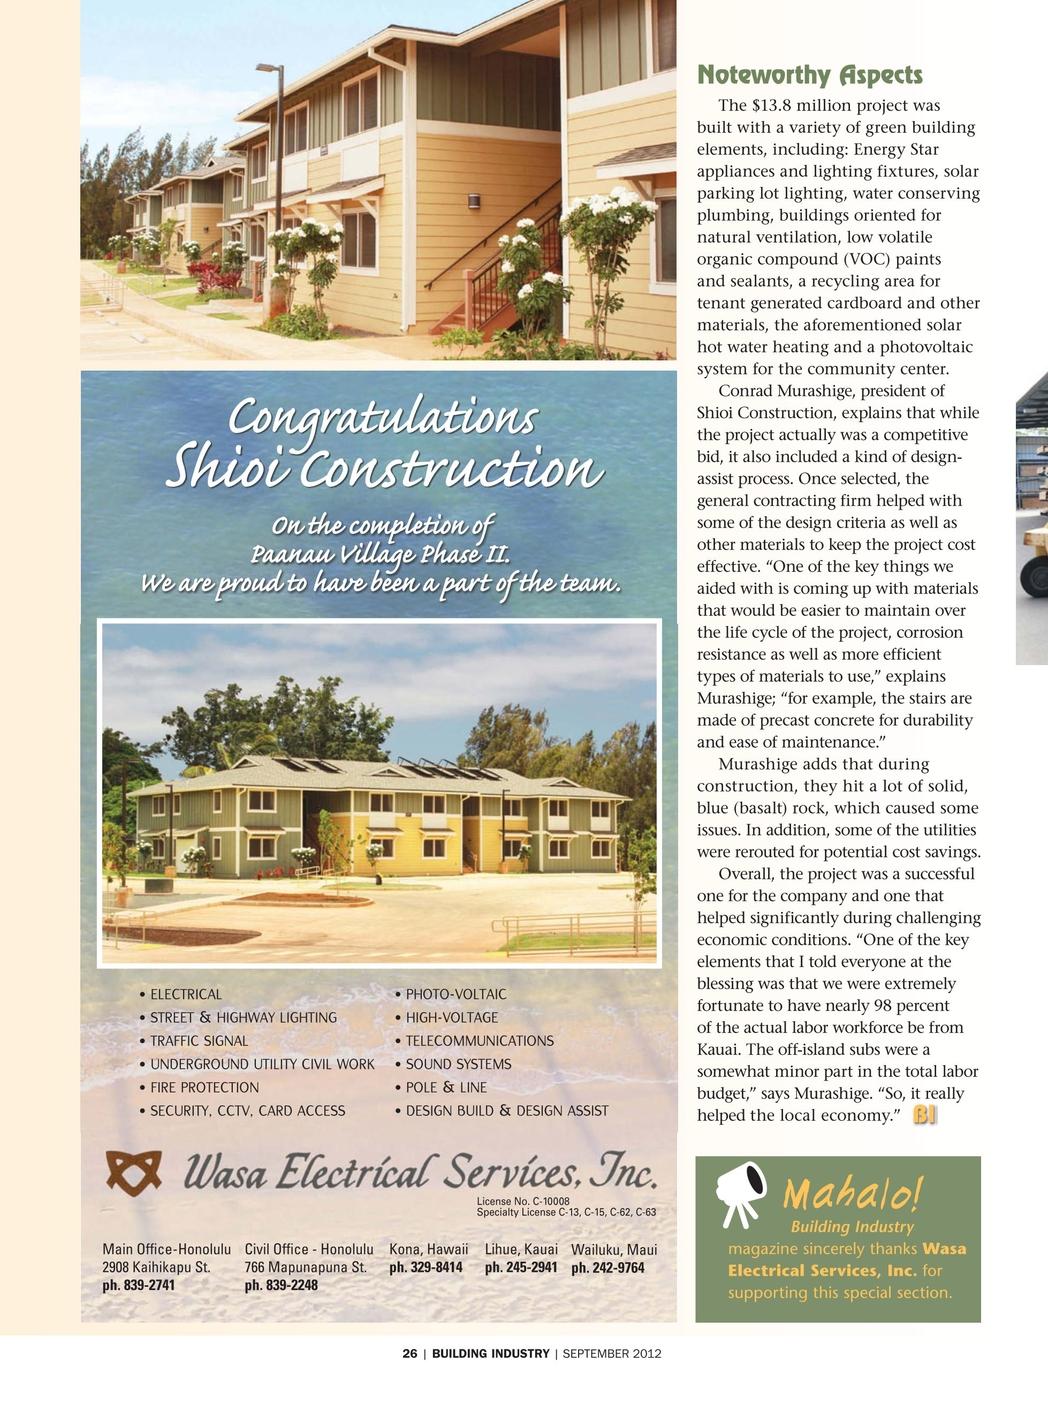 Building Industry Magazine September 2012 30 31